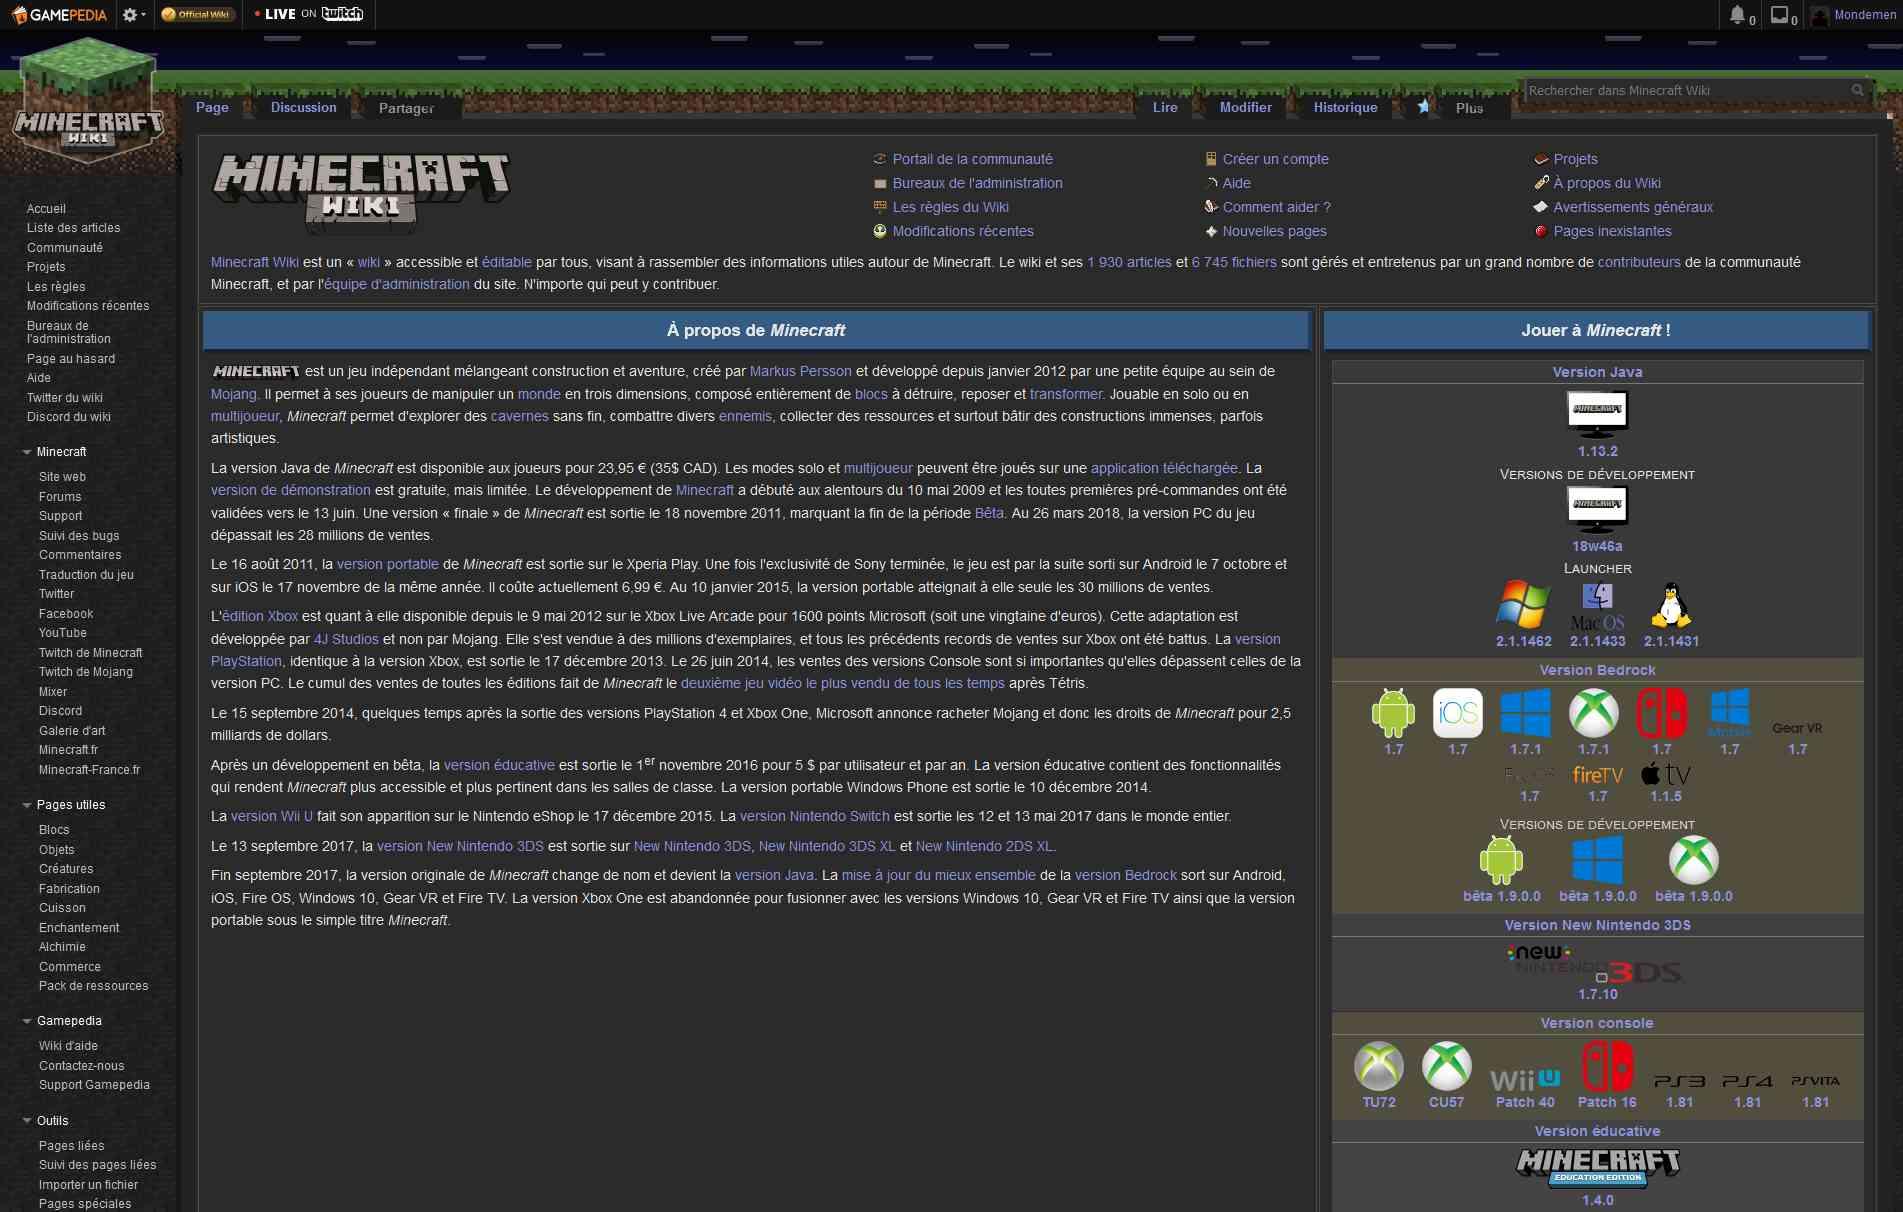 Minecraft Wiki FR - Night Mode   Userstyles org